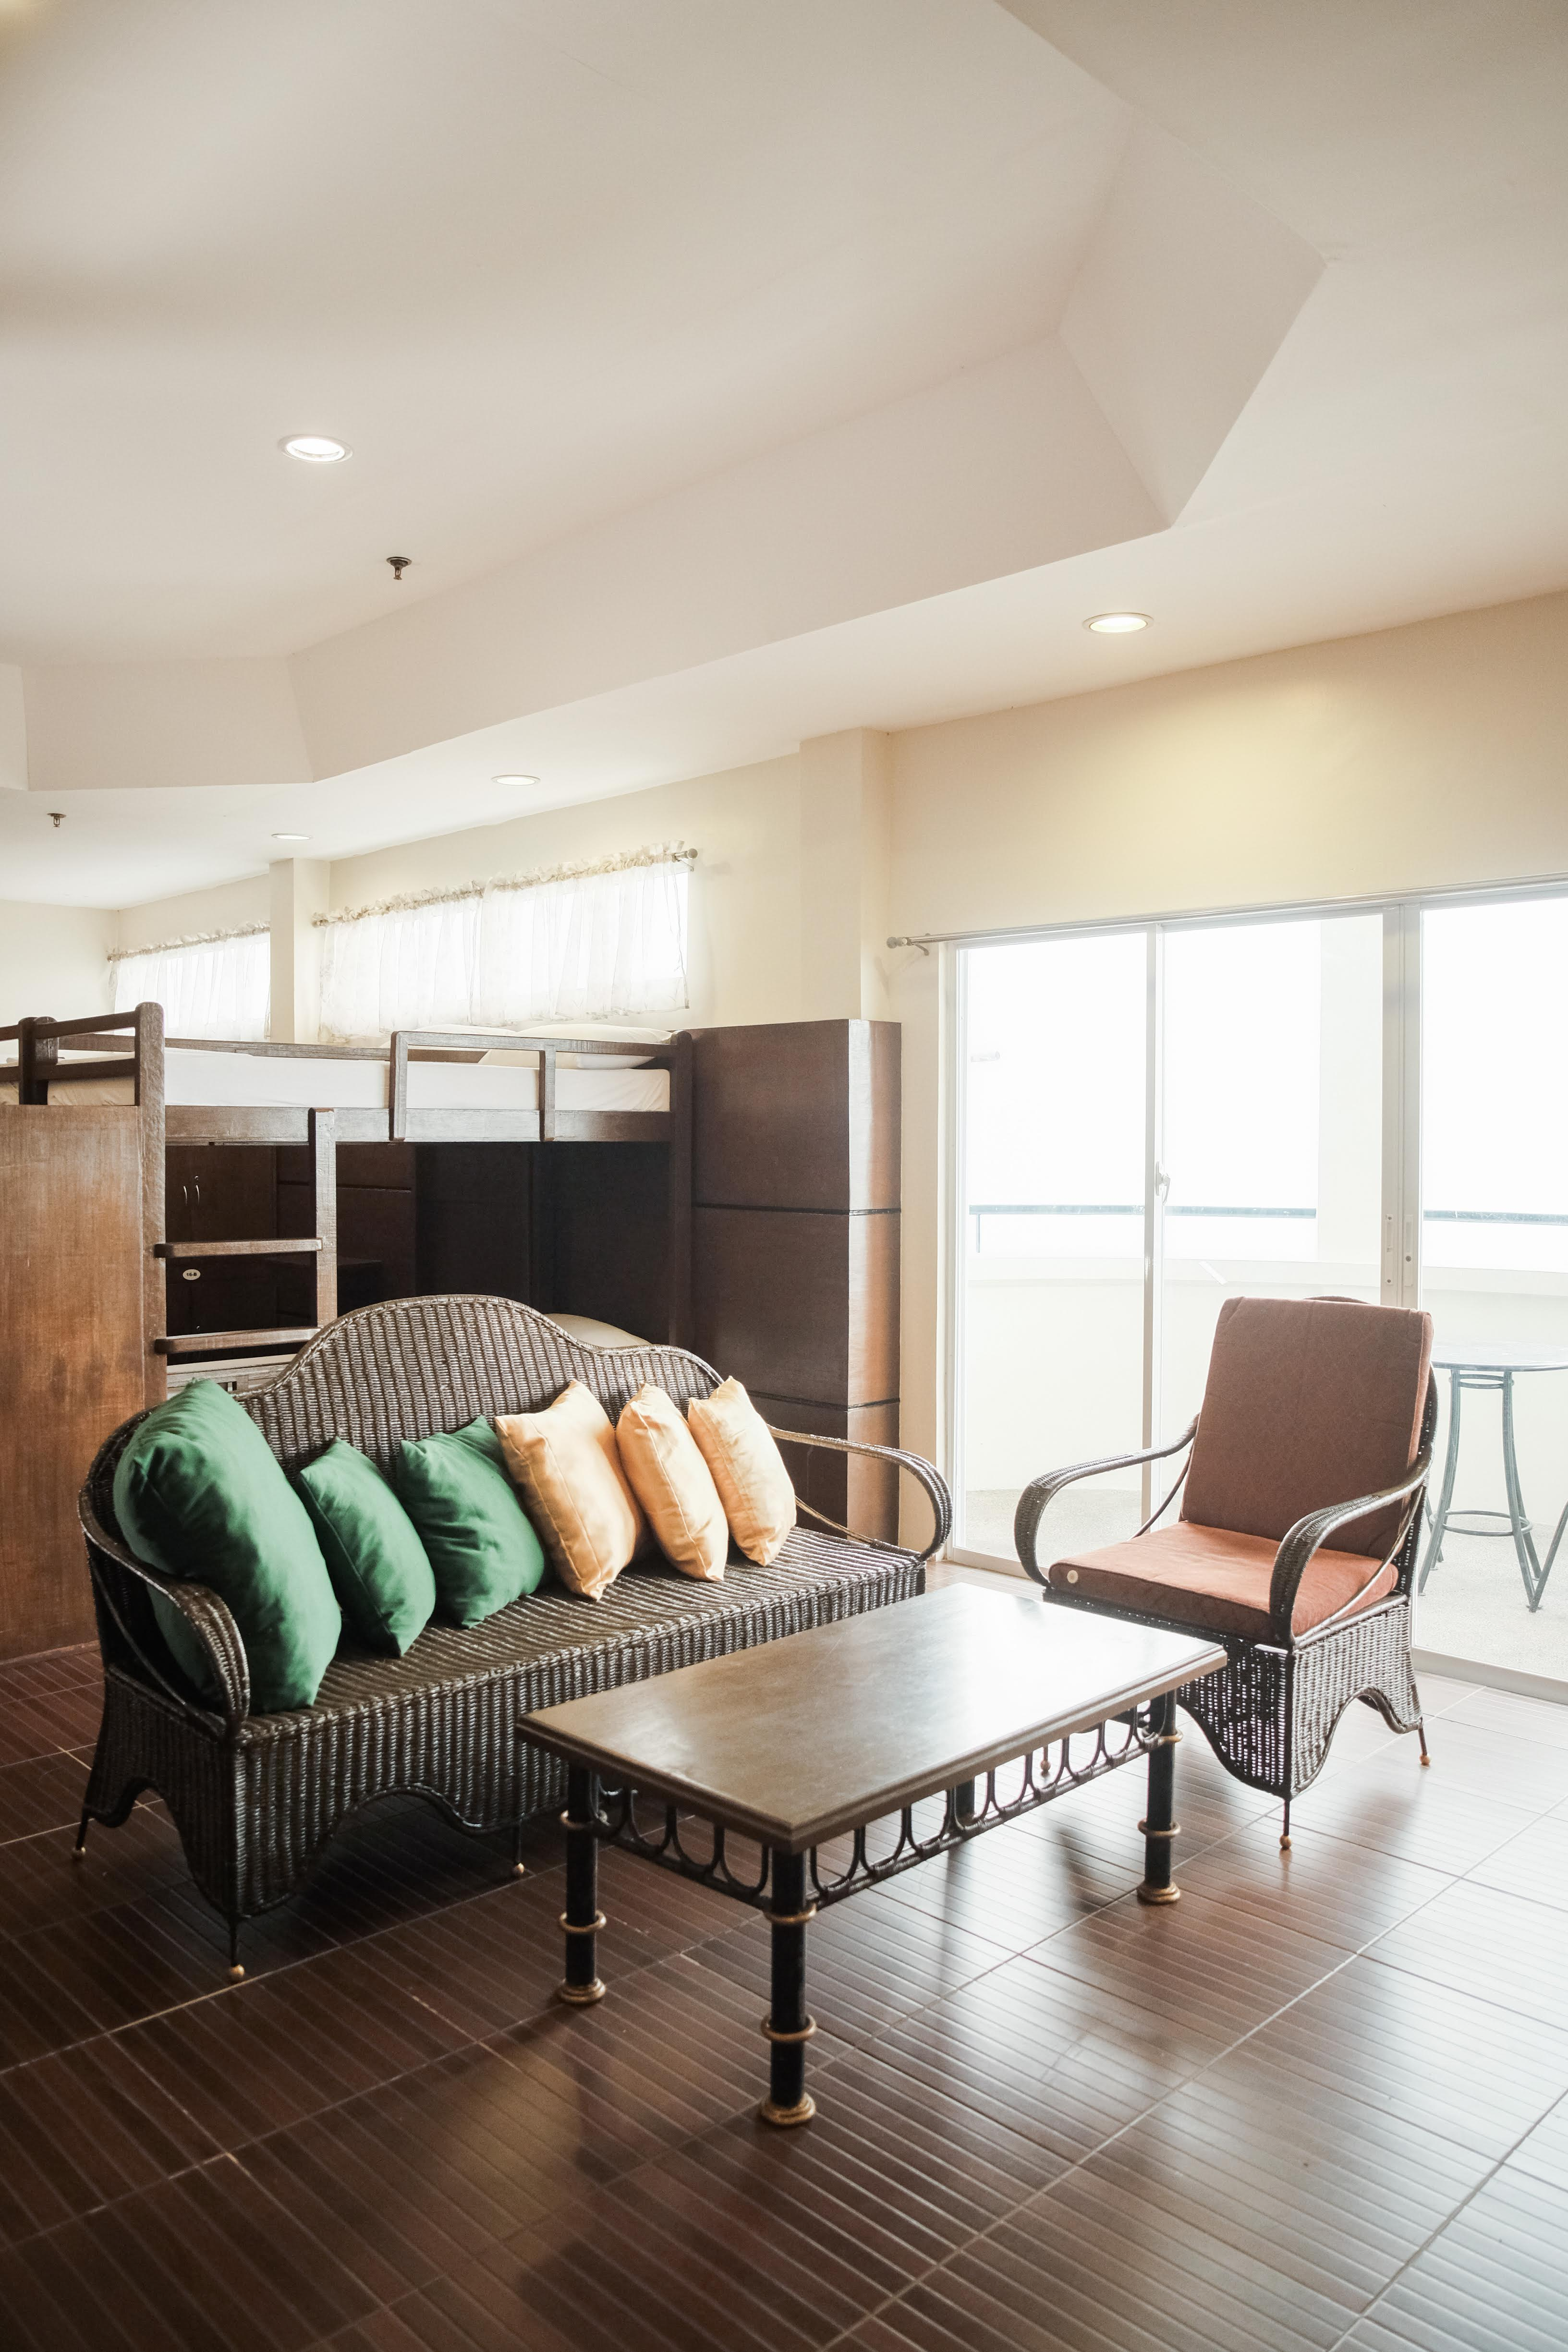 Hotel Dormitory A